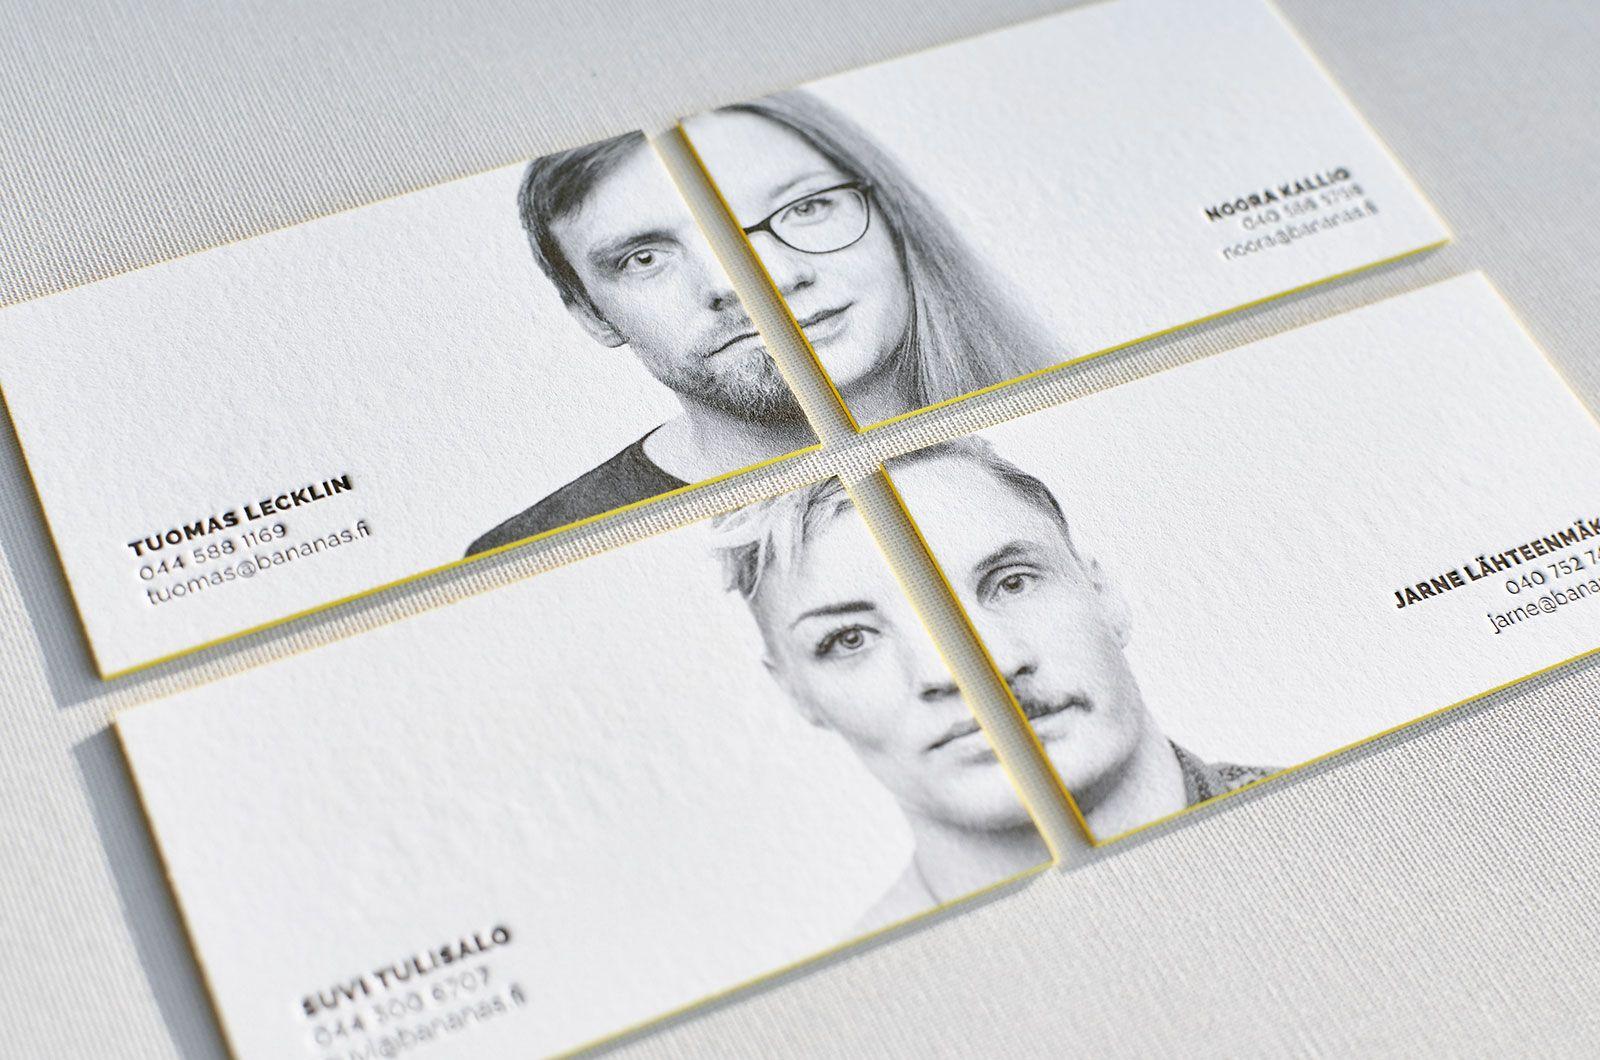 Letterpress Business Cards with Portrait Photography | ELEGANTE PRESS